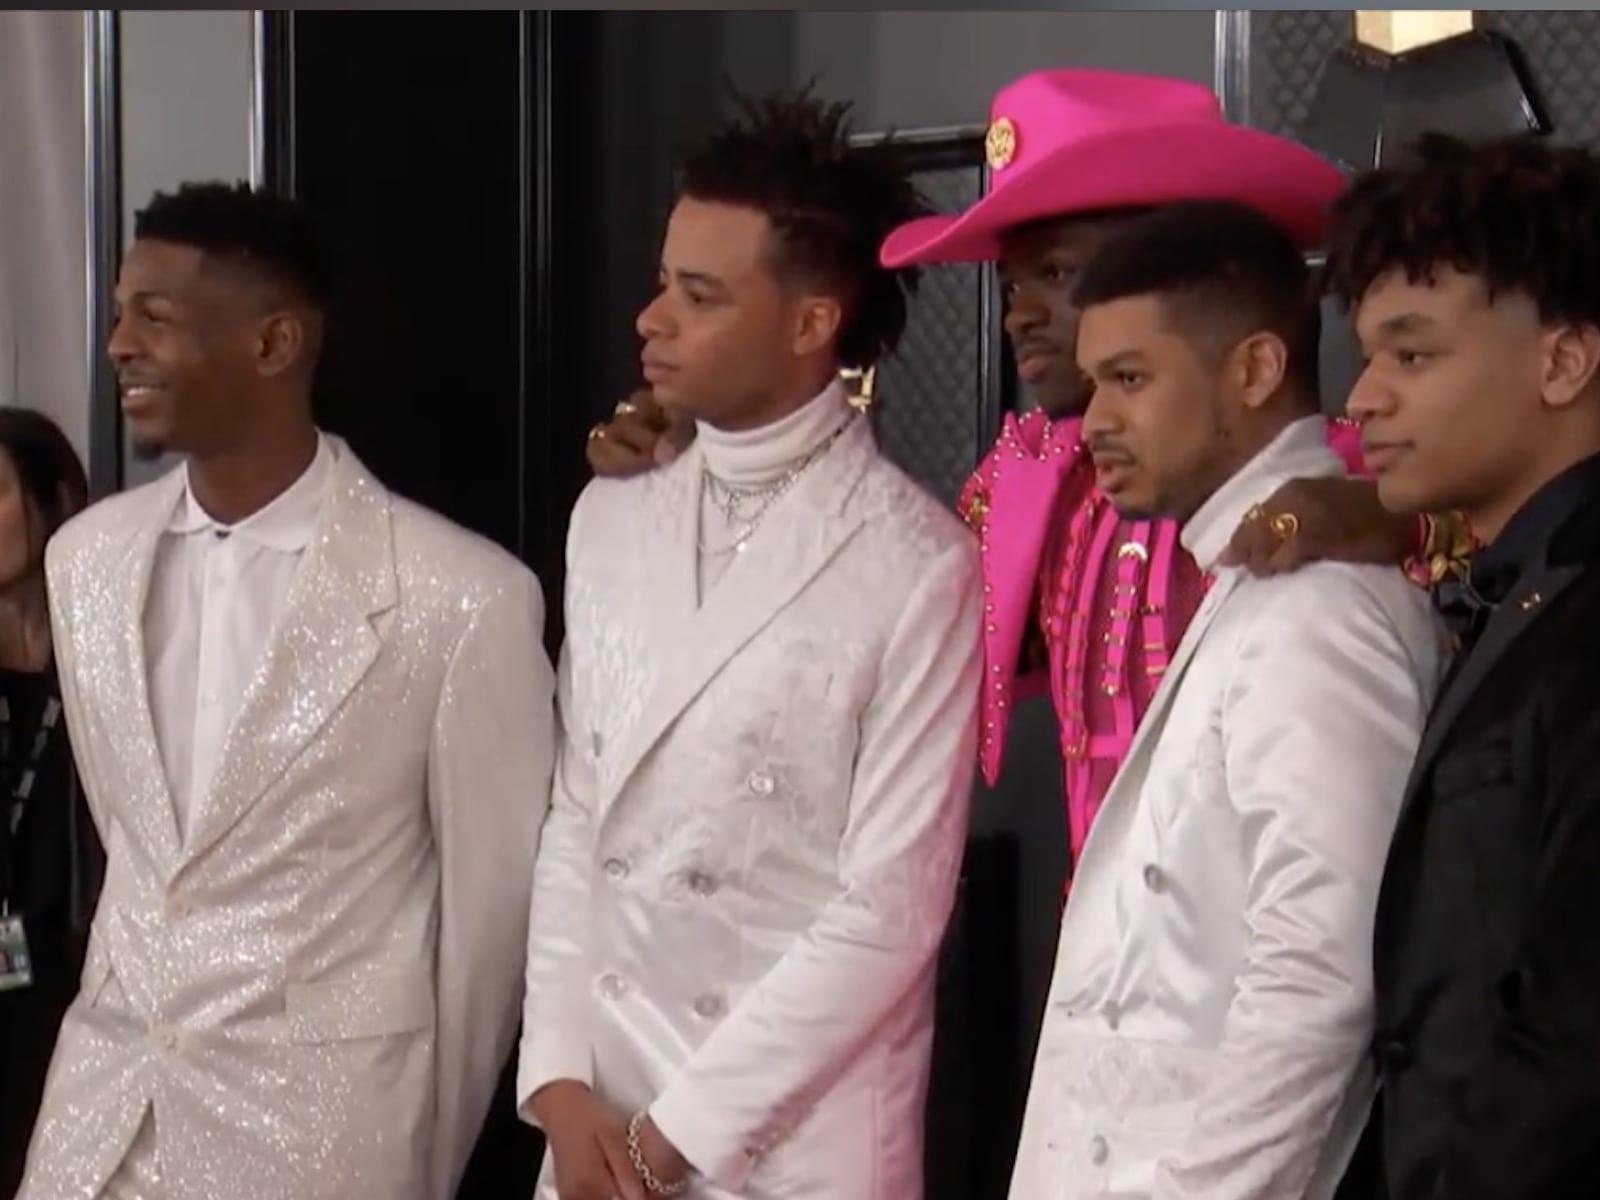 Lil Nas X 2020 Grammys Red Carpet Video